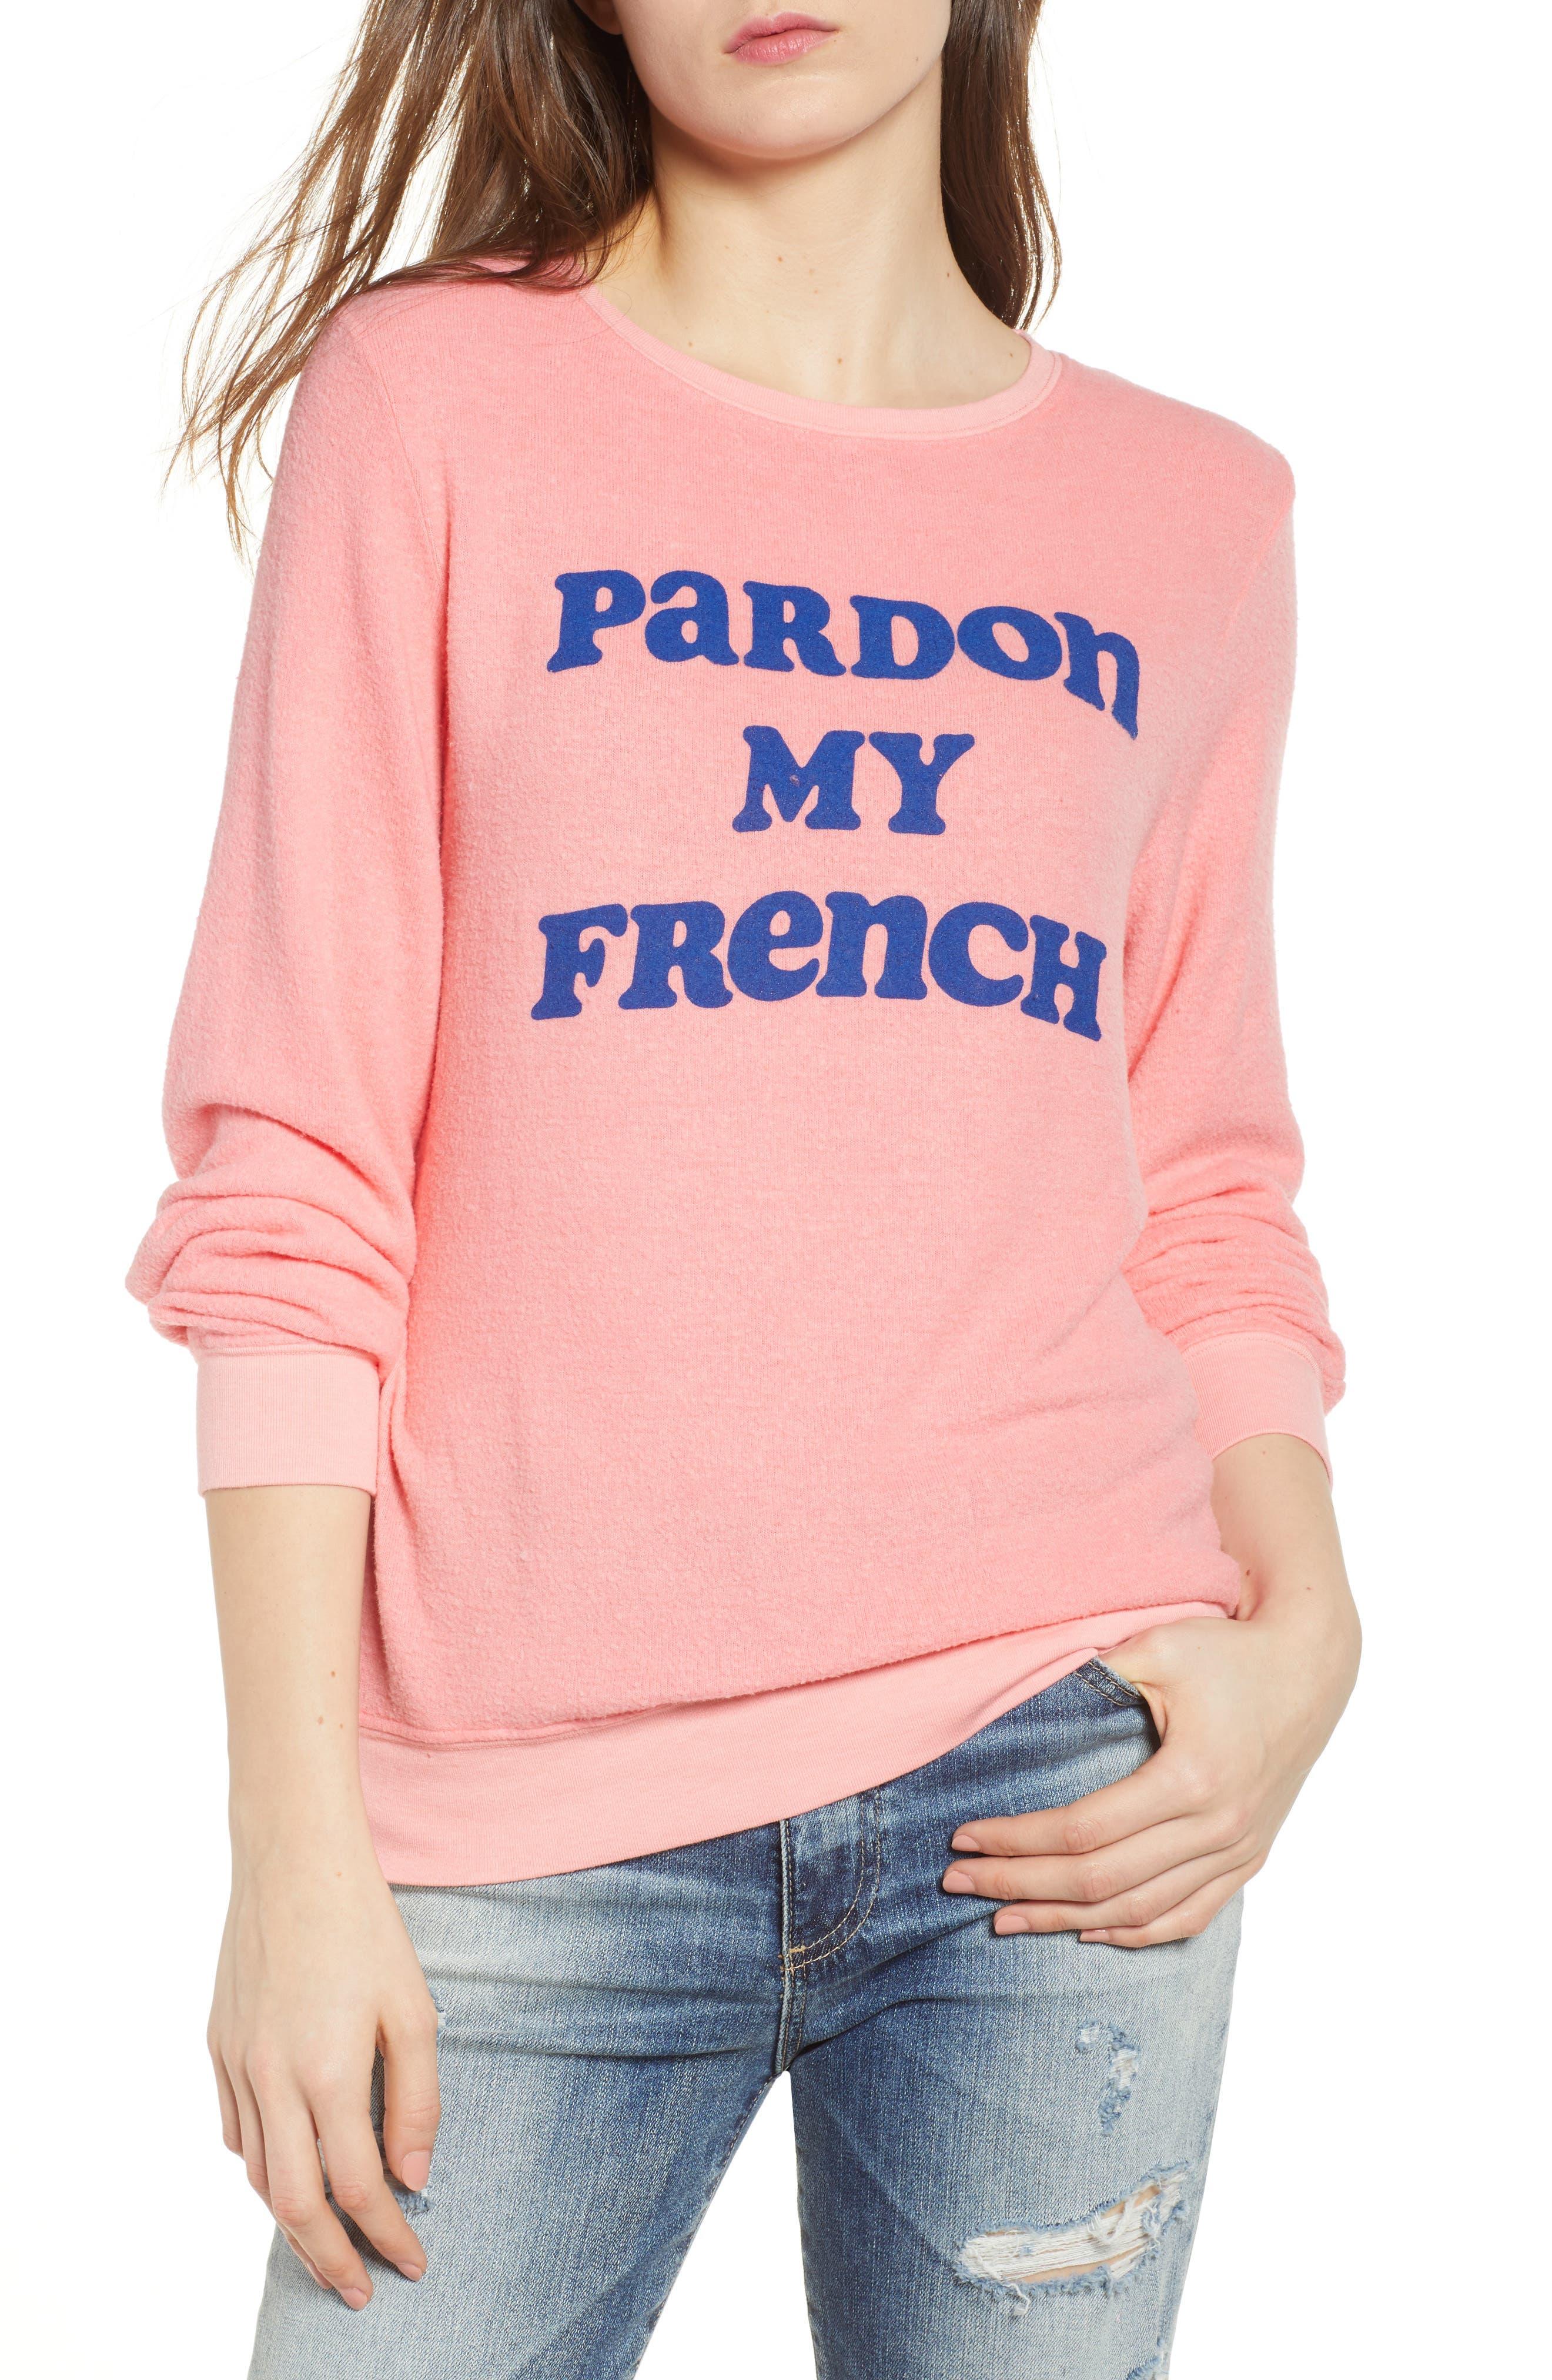 Pardon My French Sweatshirt,                             Main thumbnail 1, color,                             950